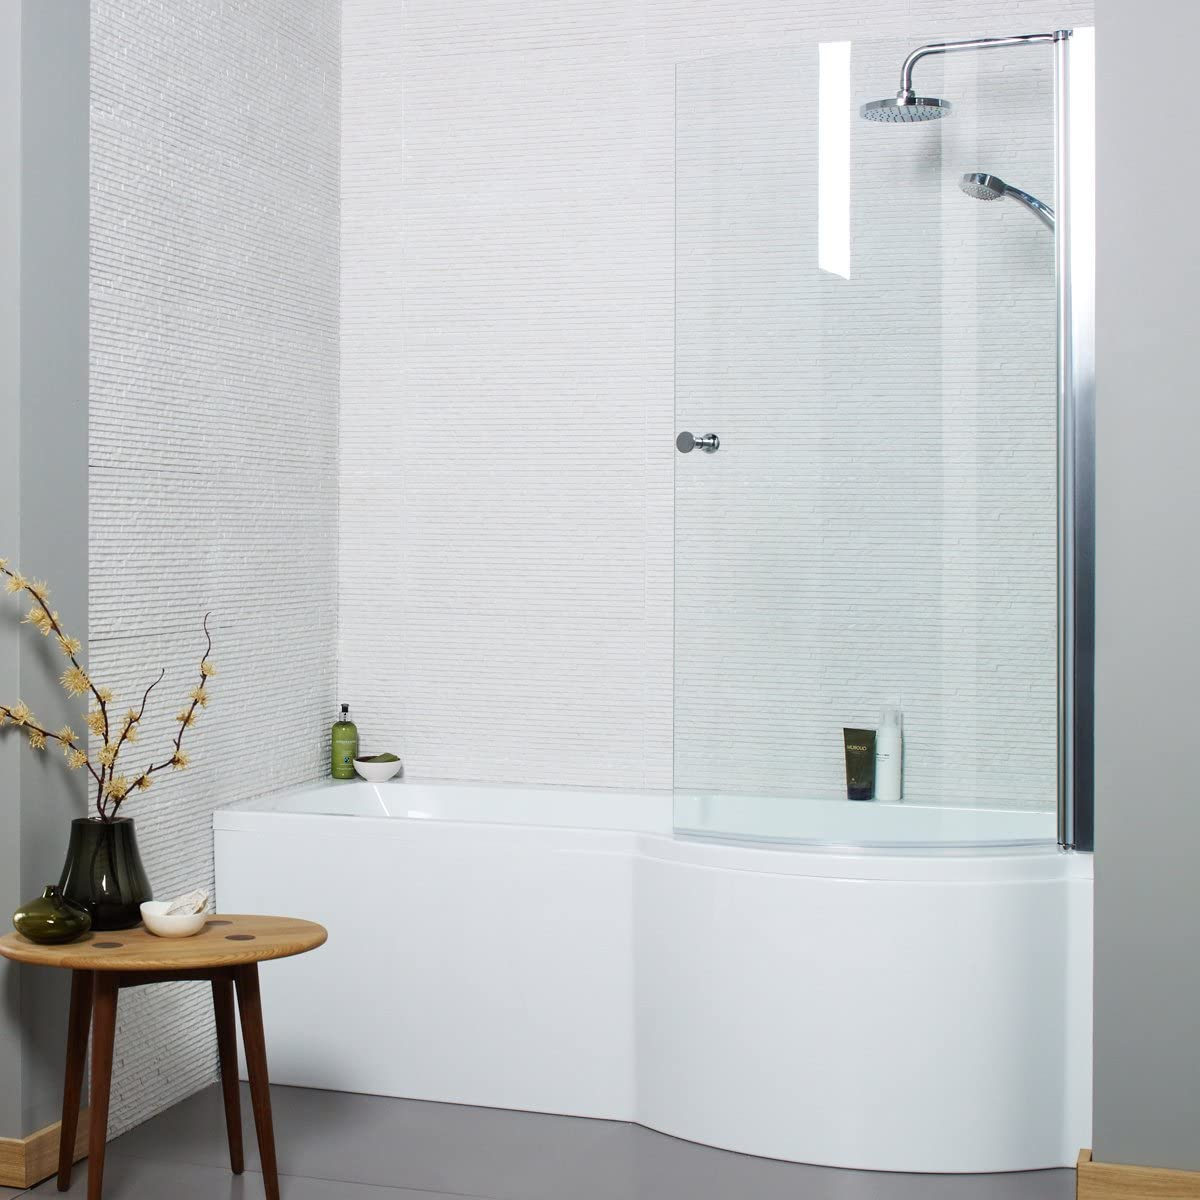 Adapt p-shaped ducha bañera con Panel de pantalla curva 1700 x 850 mm, Mano Derecha: Amazon.es: Hogar